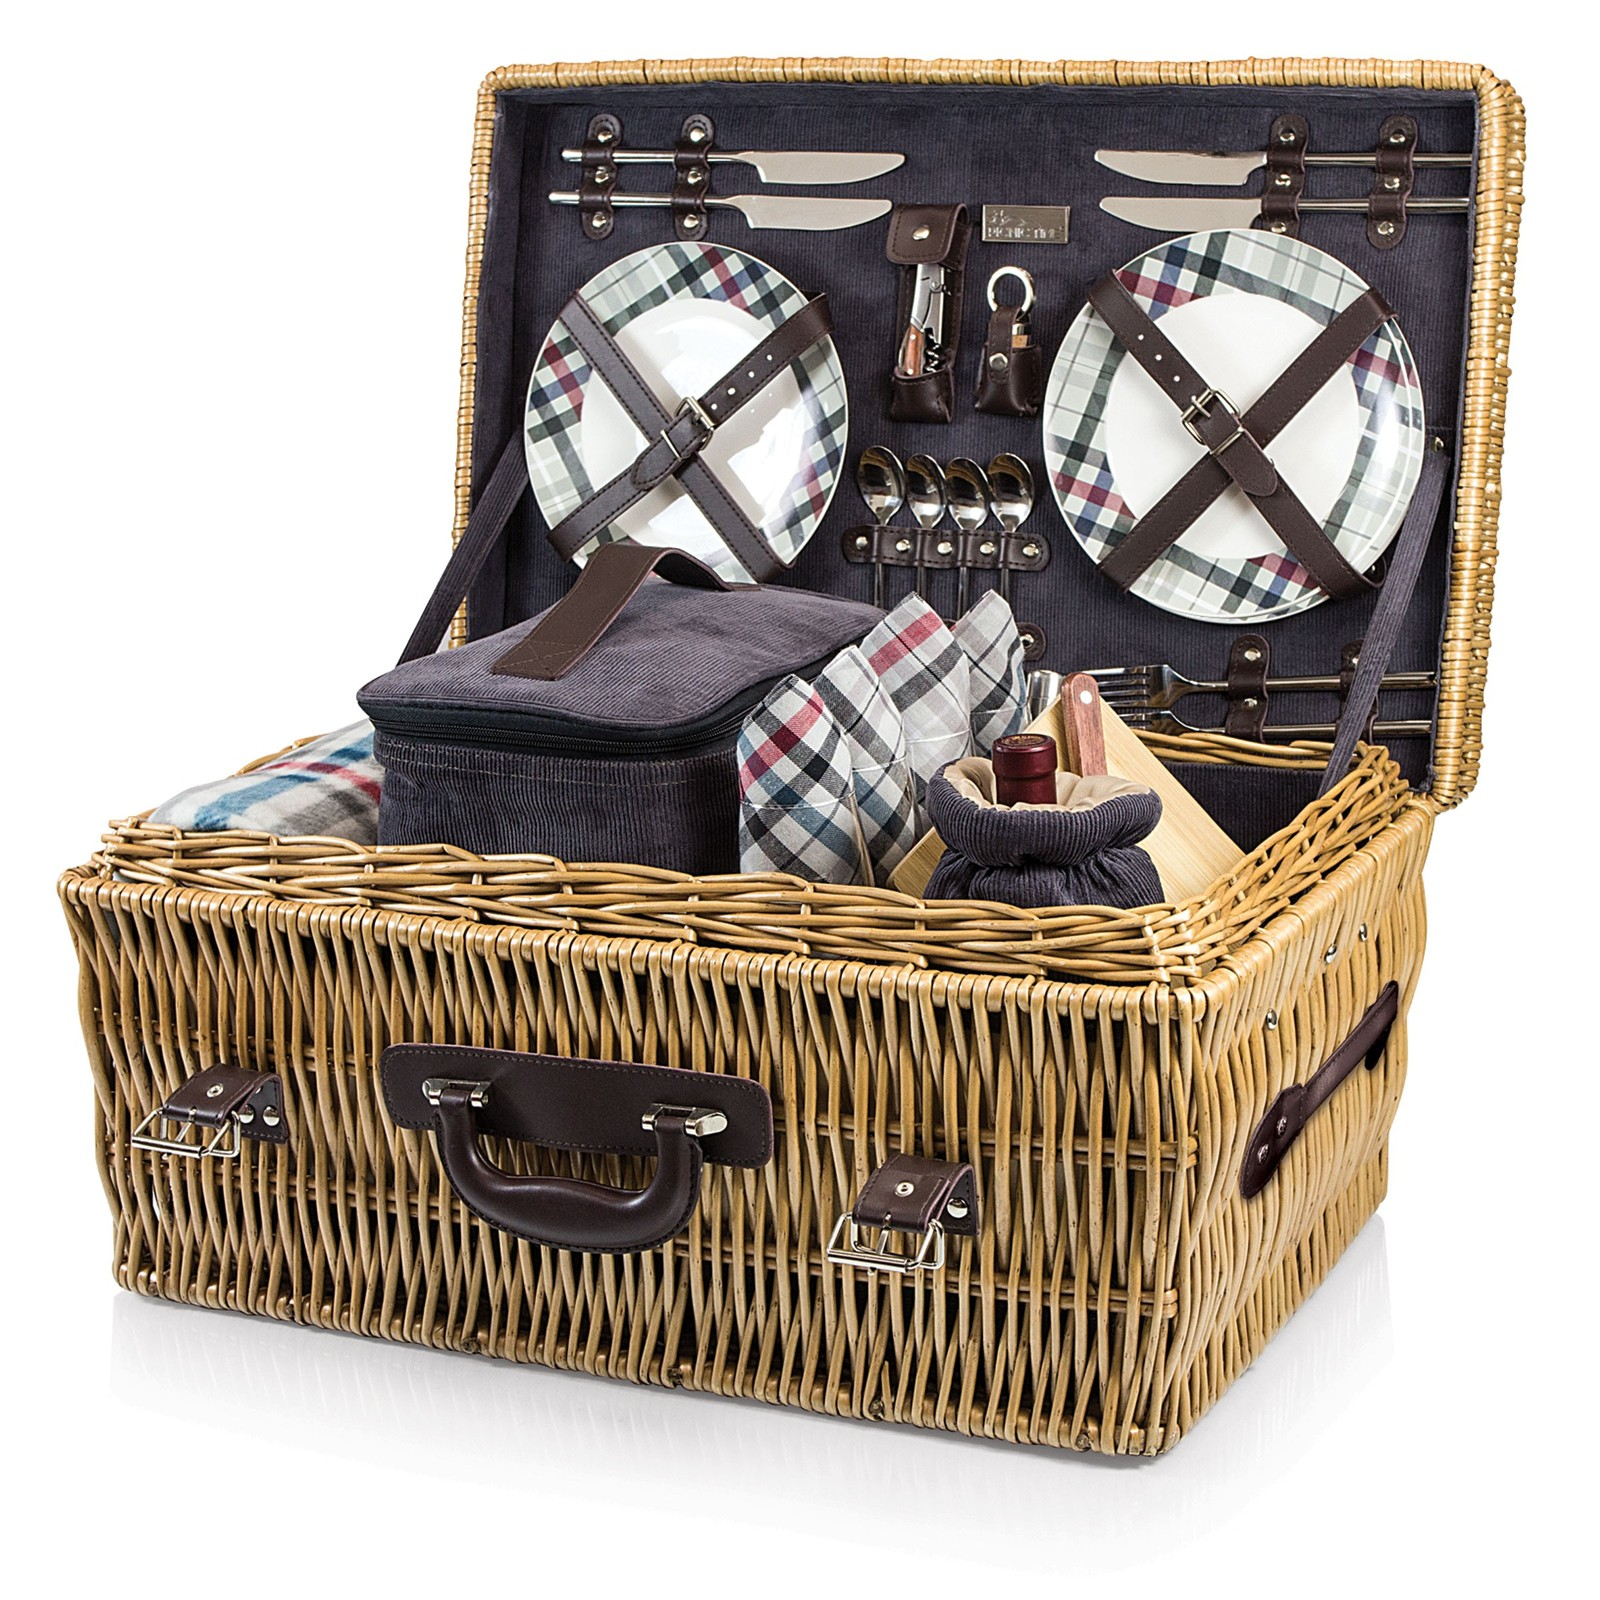 211 91 778  canary picnic basket